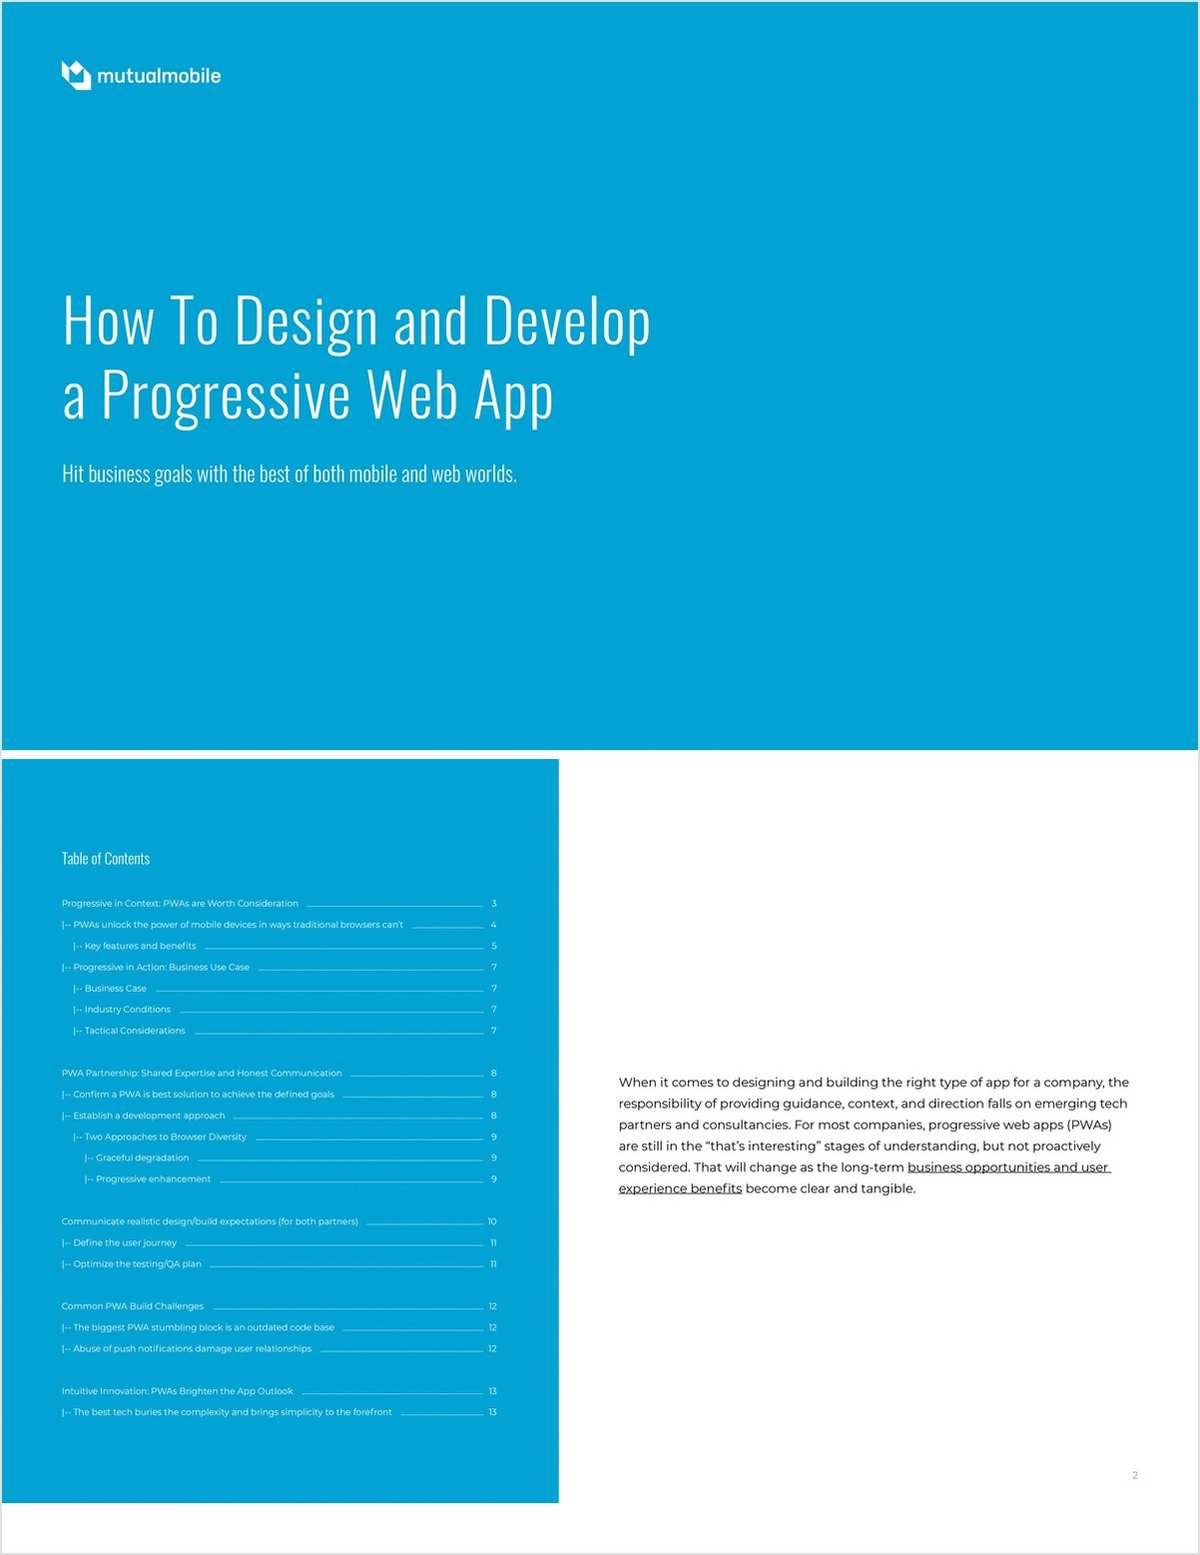 How To Design and Develop a Progressive Web App